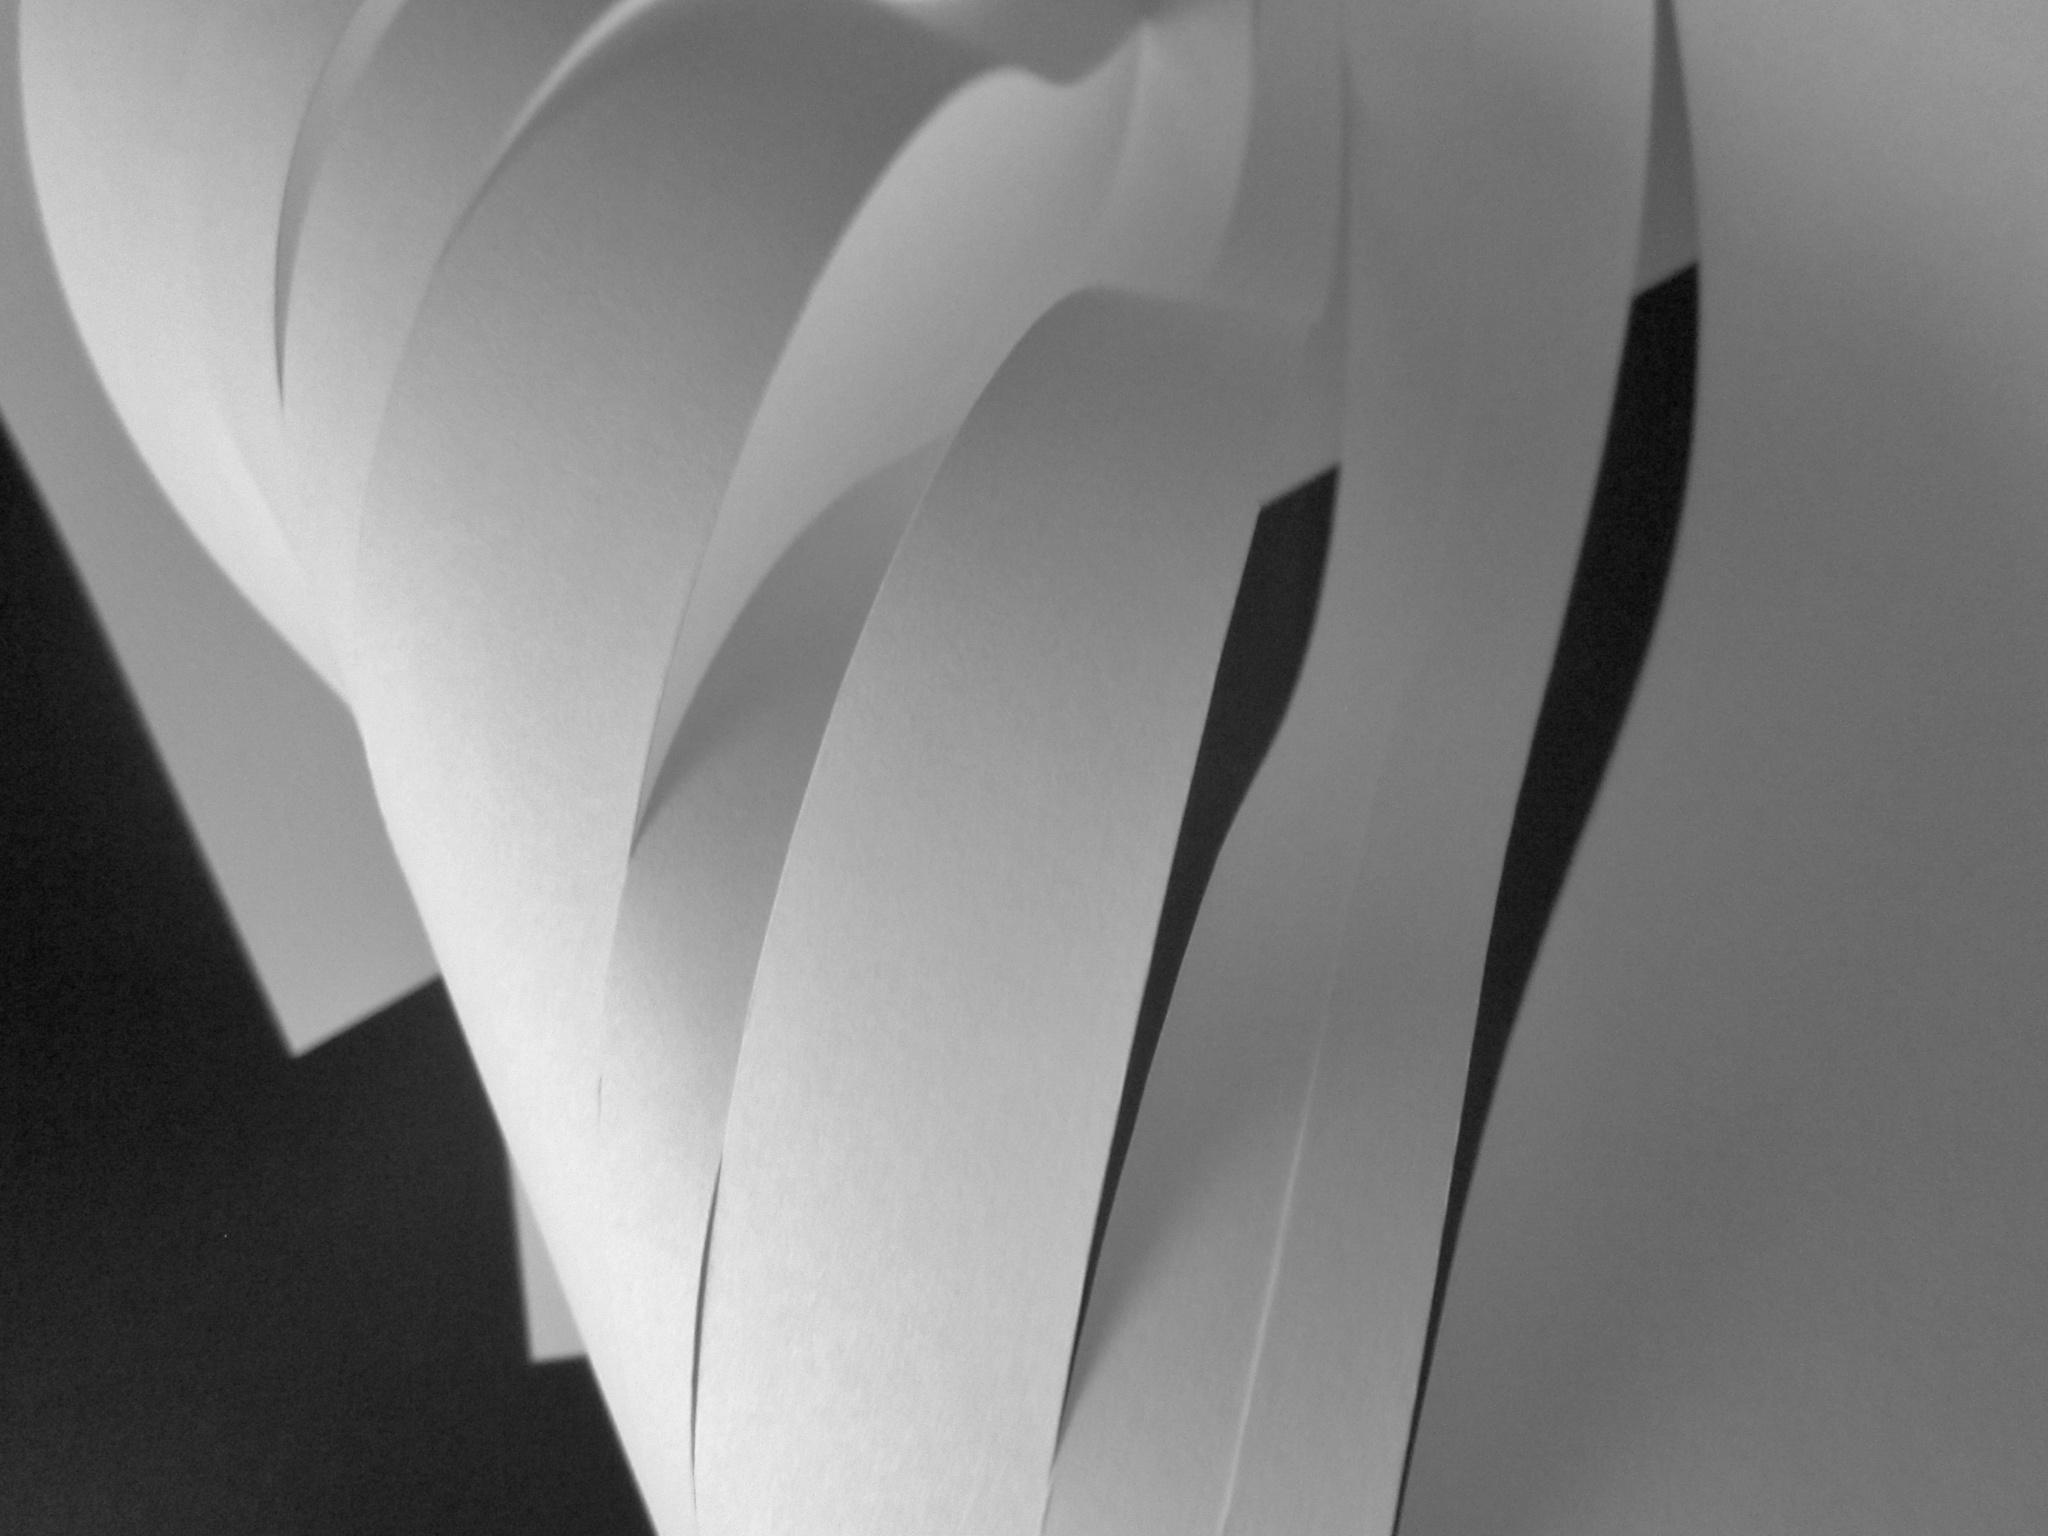 papiersculptuur by pierrevandenbroeck1